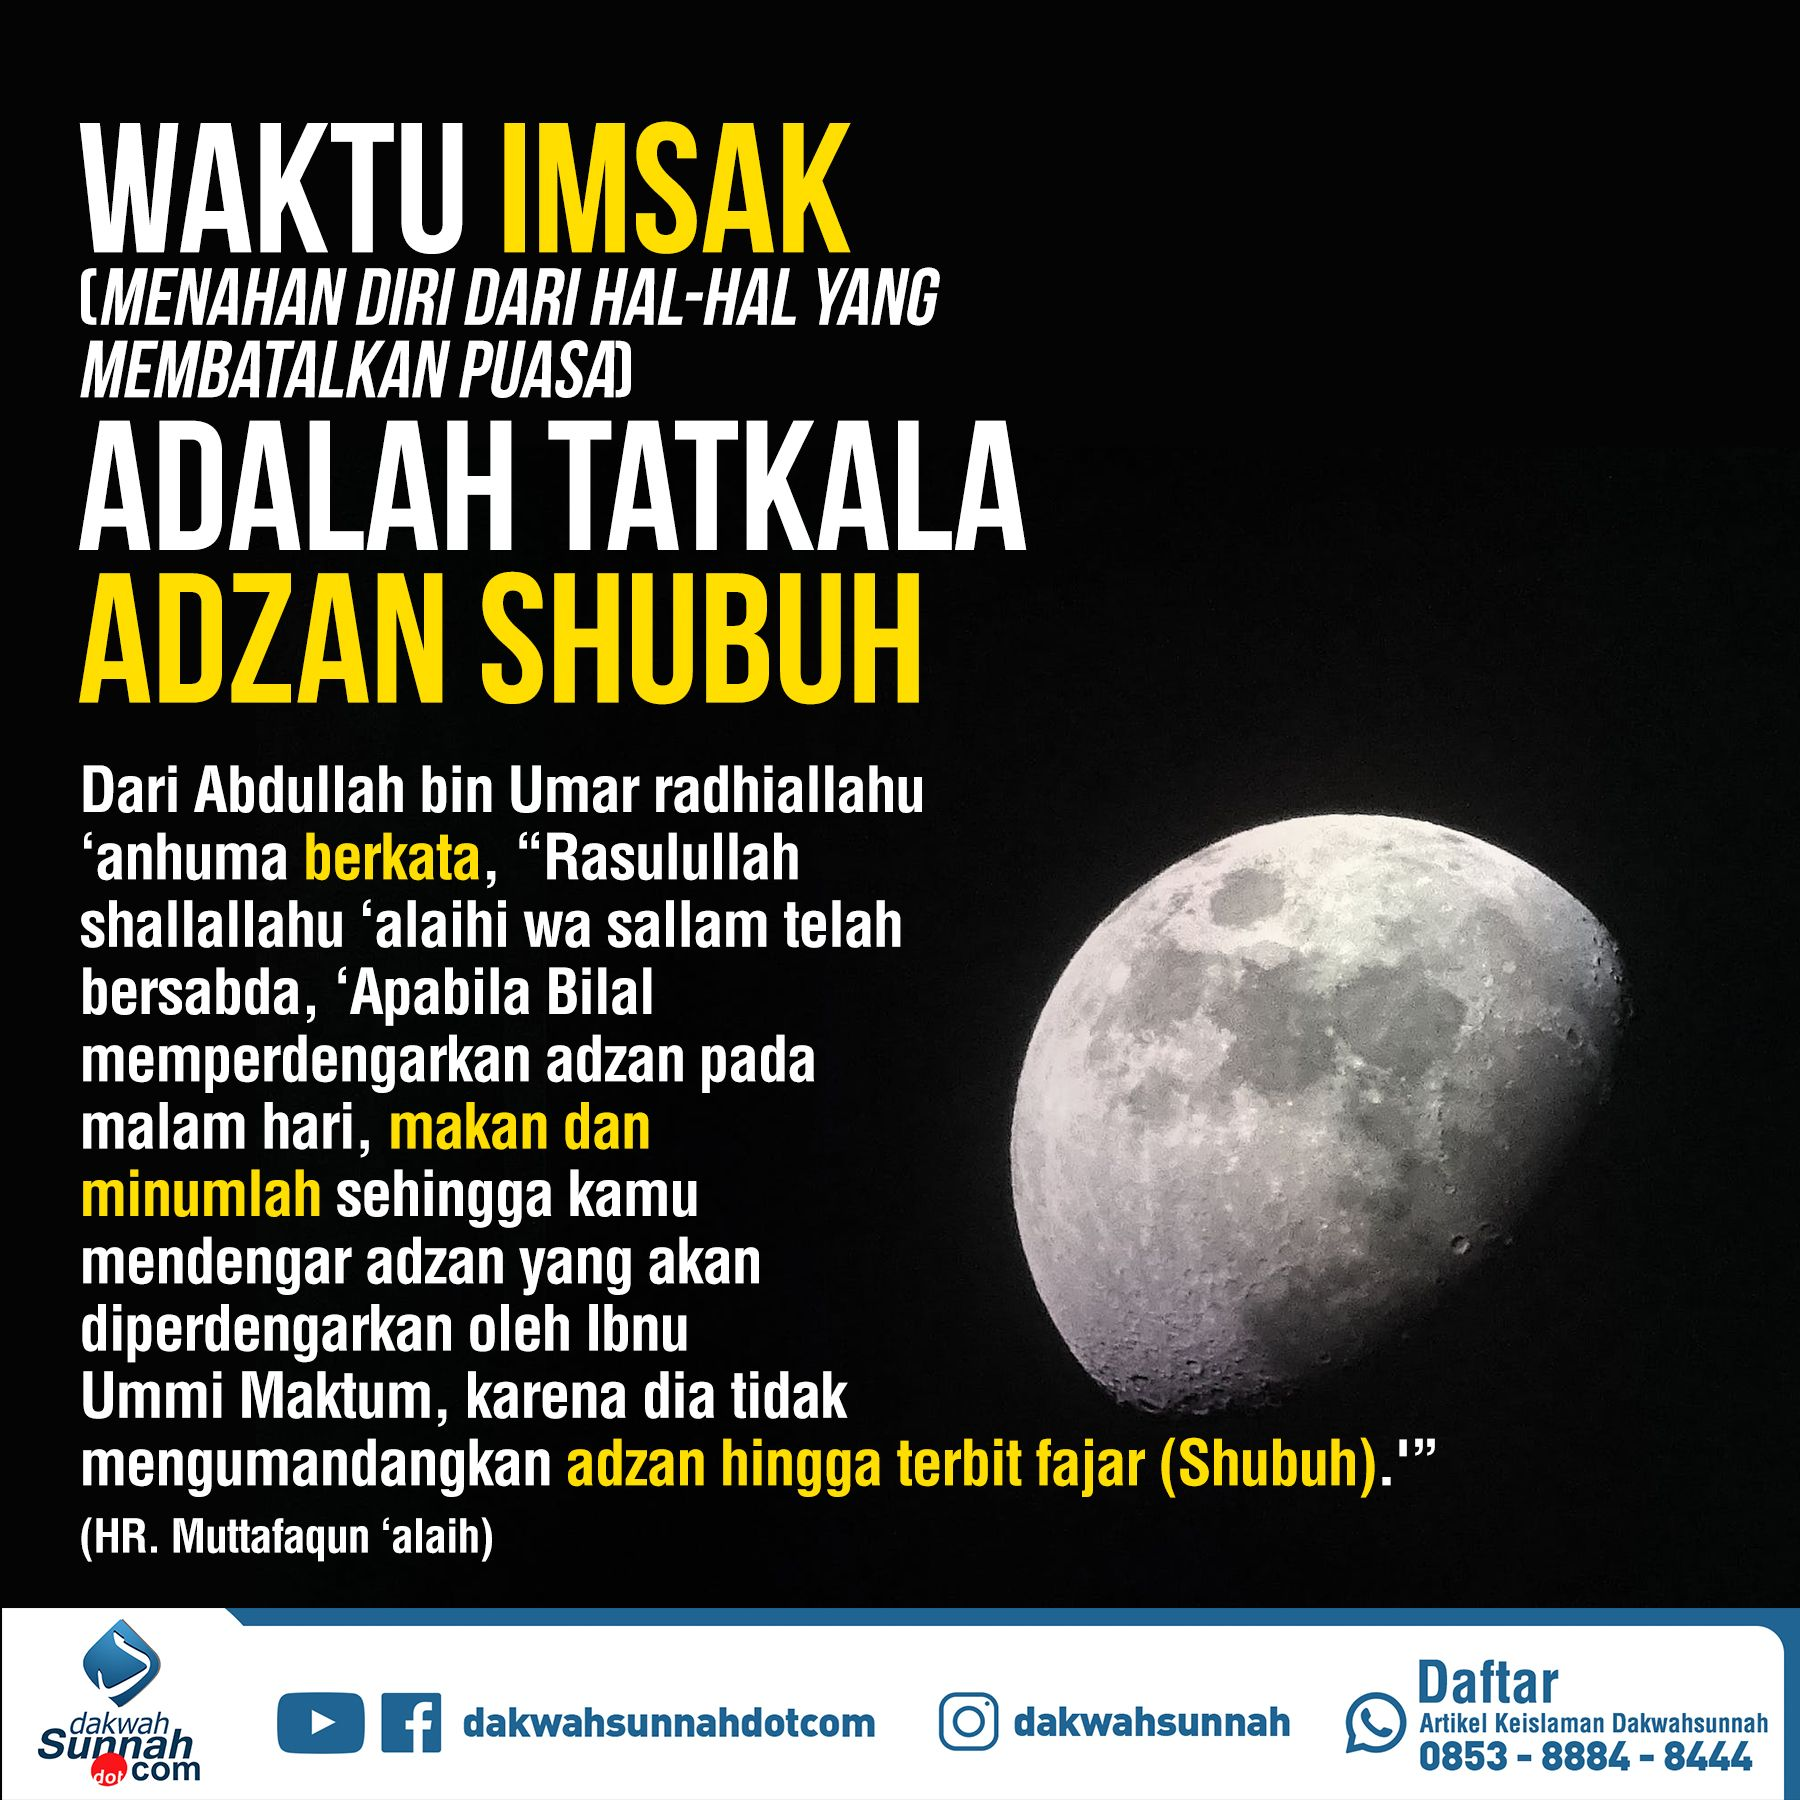 Https Muslimah Or Id 2196 Waktu Imsak Beberapa Menit Sebelum